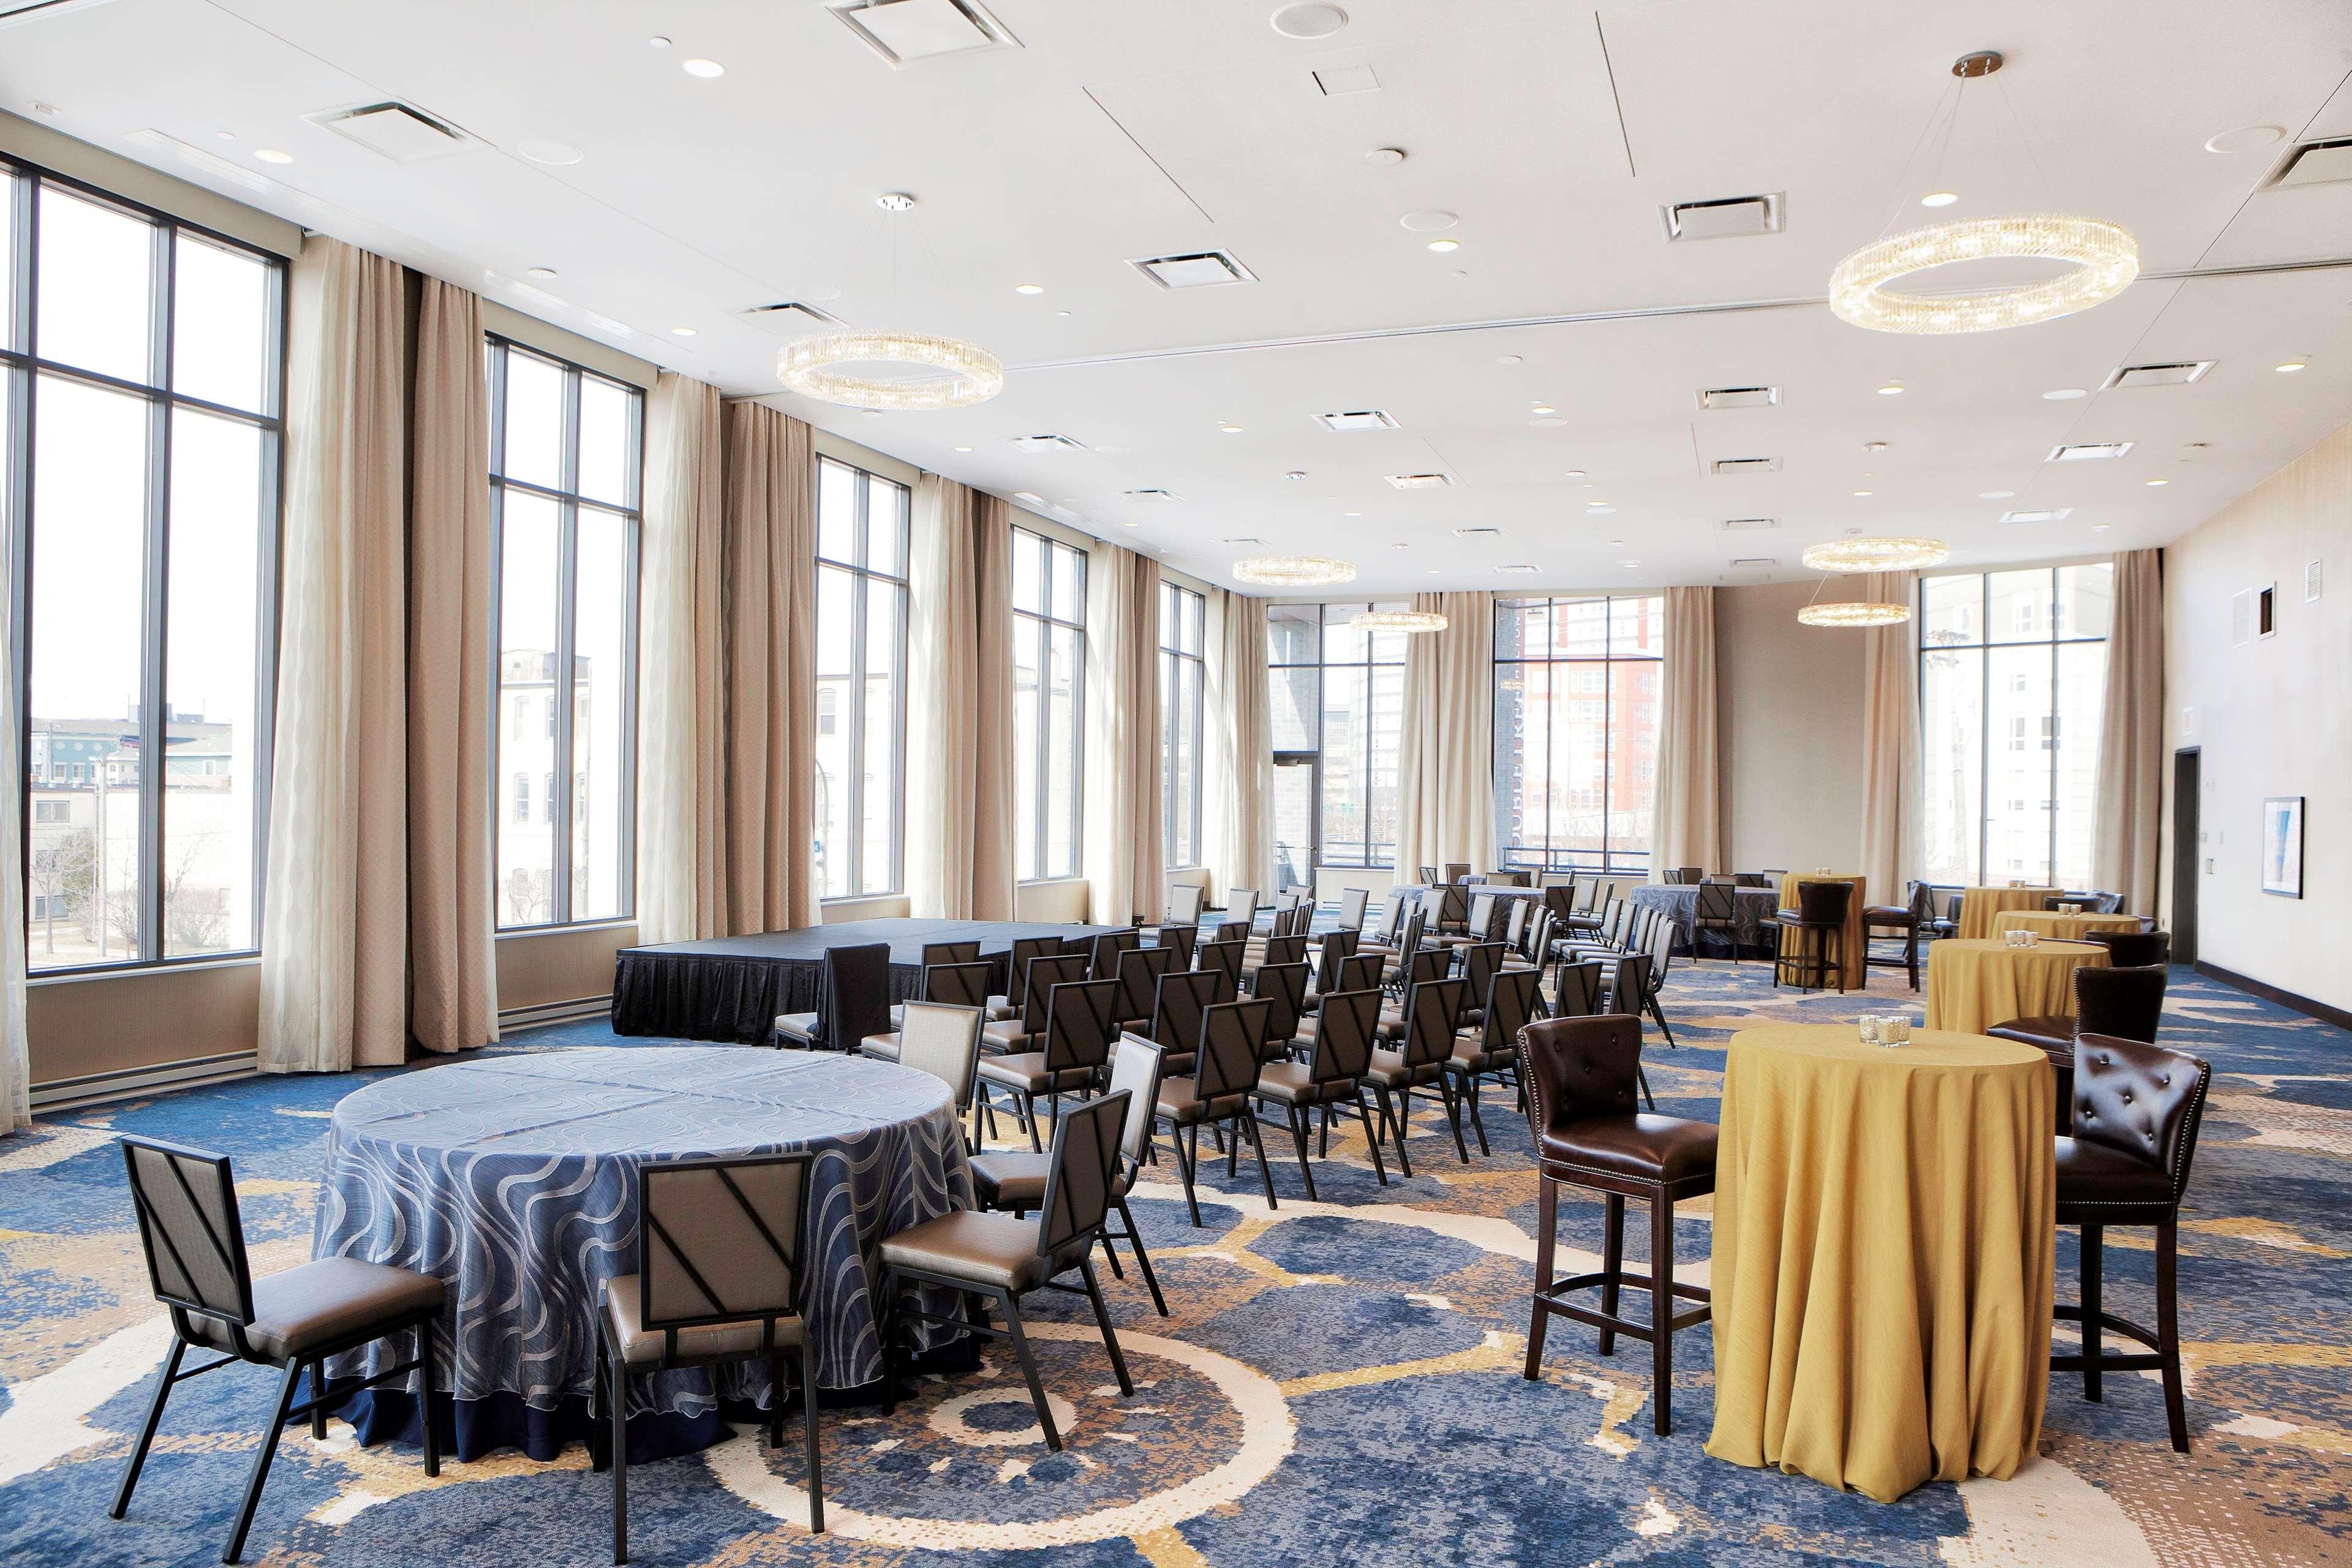 DoubleTree by Hilton Hotel Minneapolis - University Area image 8